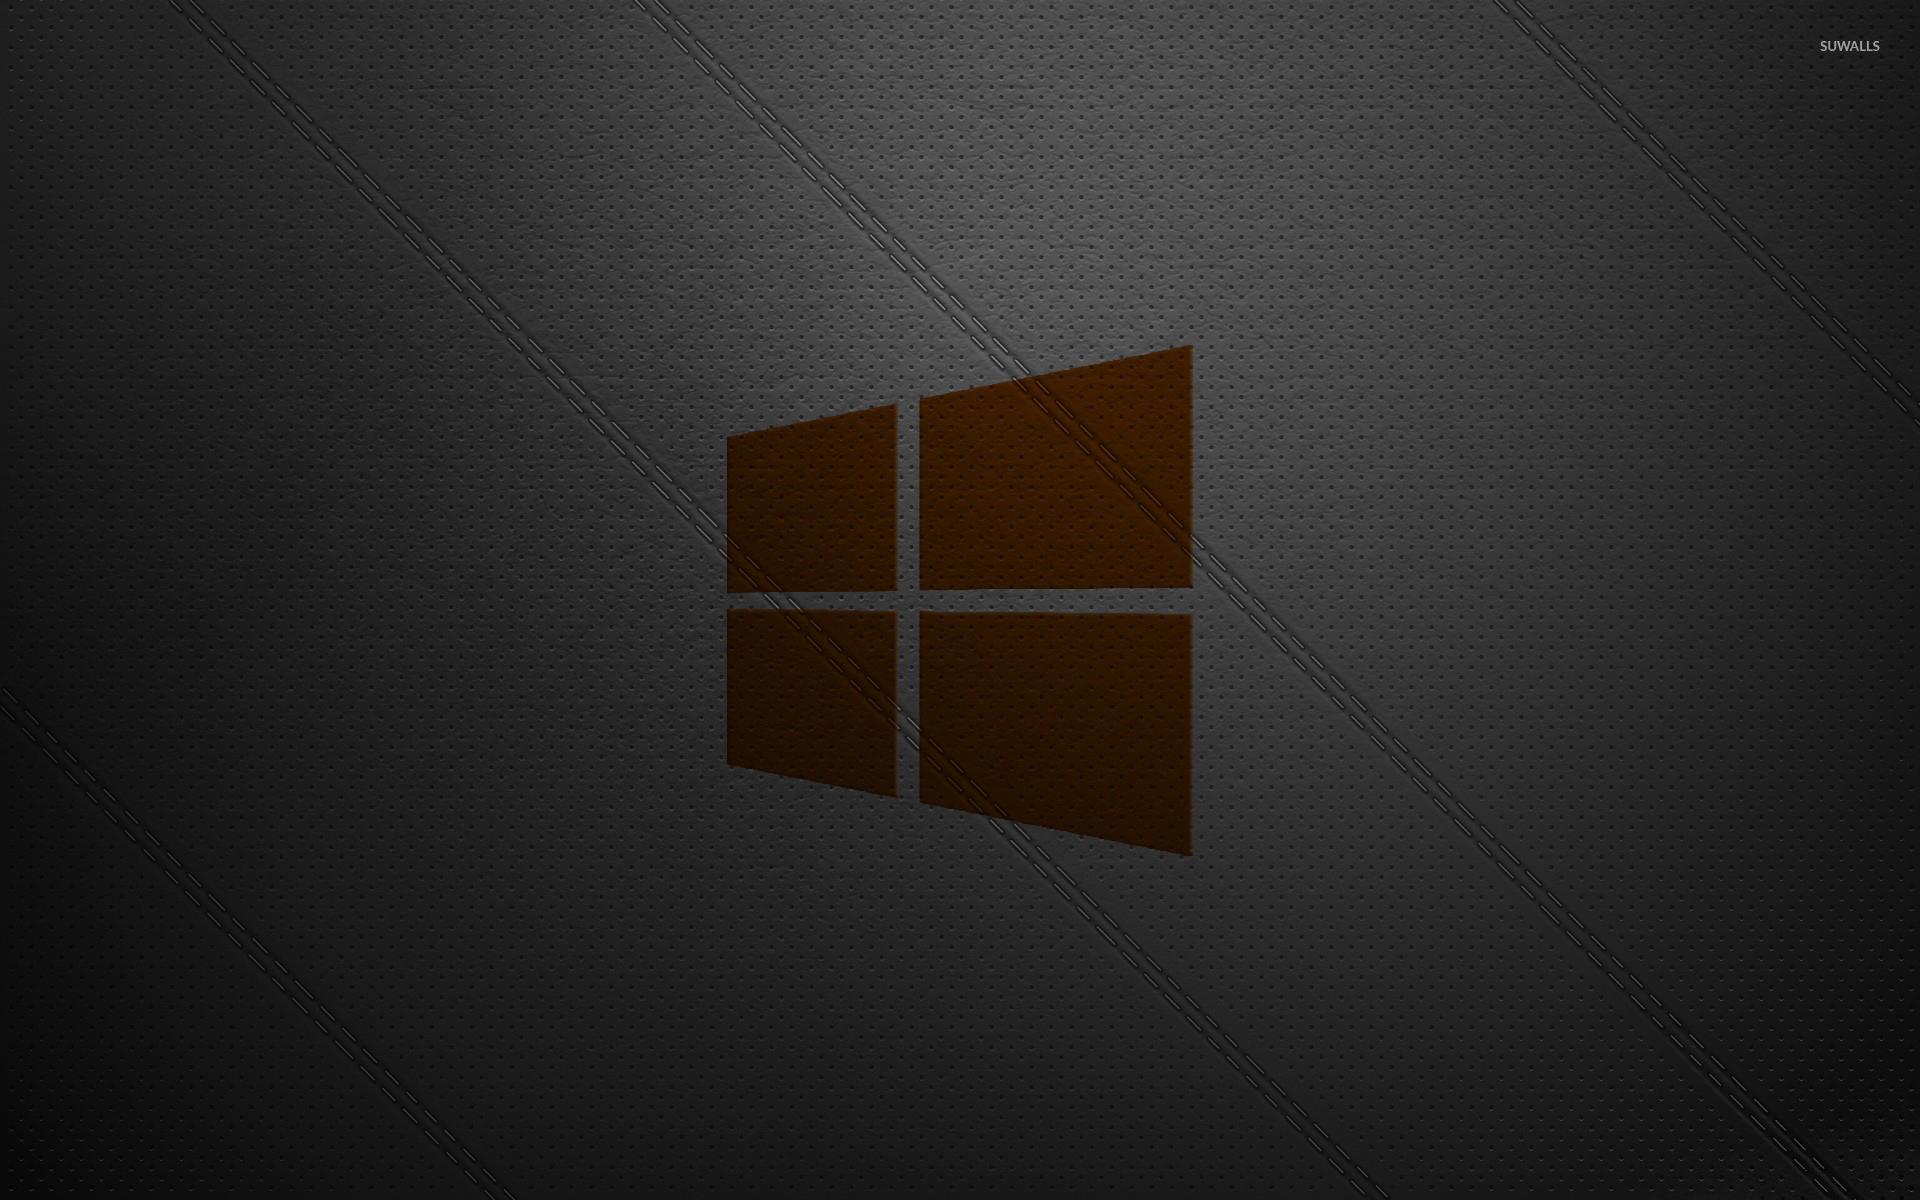 Windows 10 2 Wallpaper Computer Wallpapers 40455